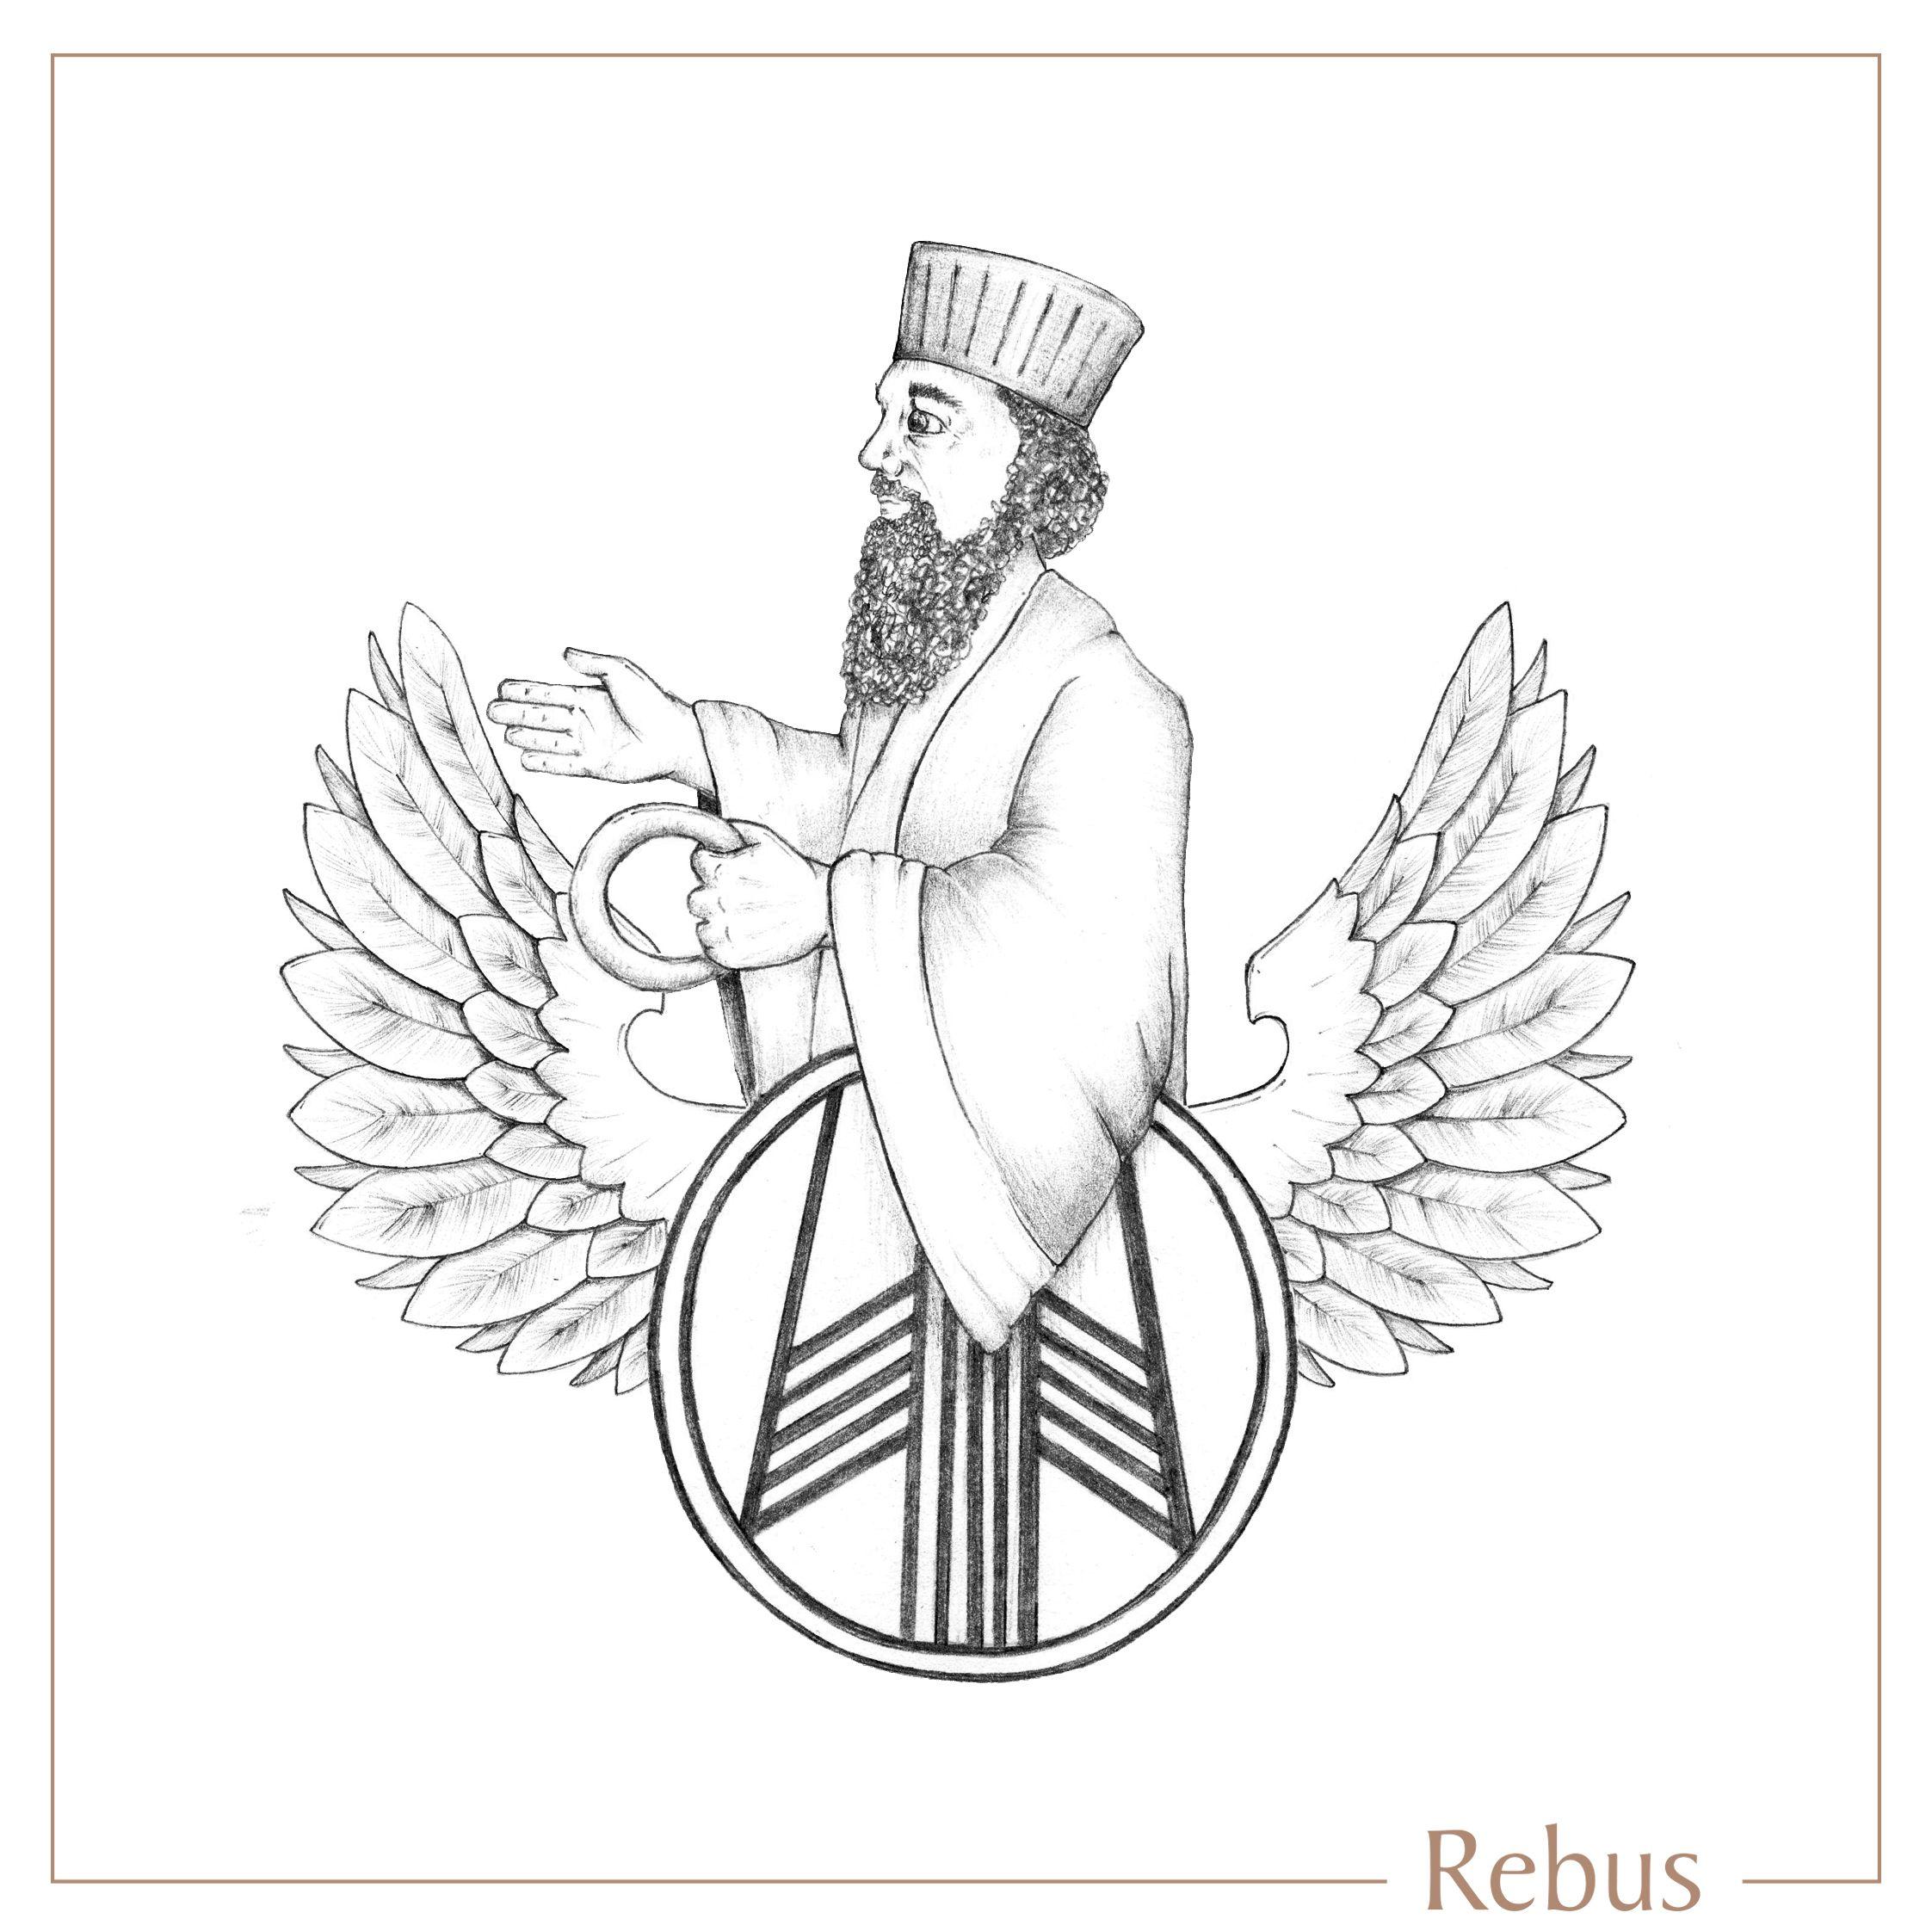 2245x2244 Wings, Man, Sketch, Handmade, Engraved, Design, Signet Ring